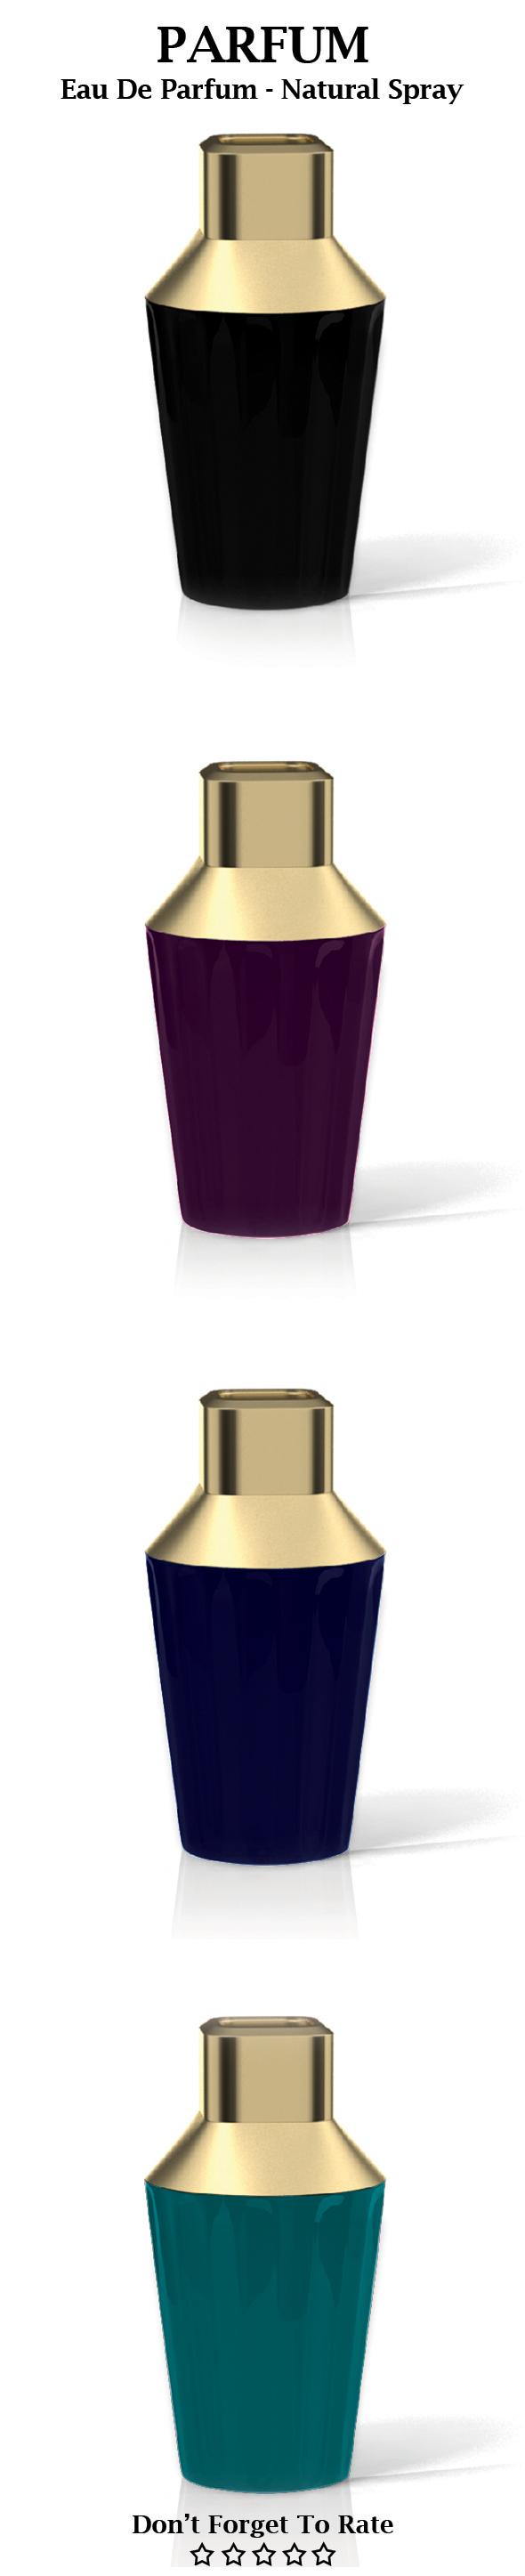 Parfum - 3DOcean Item for Sale